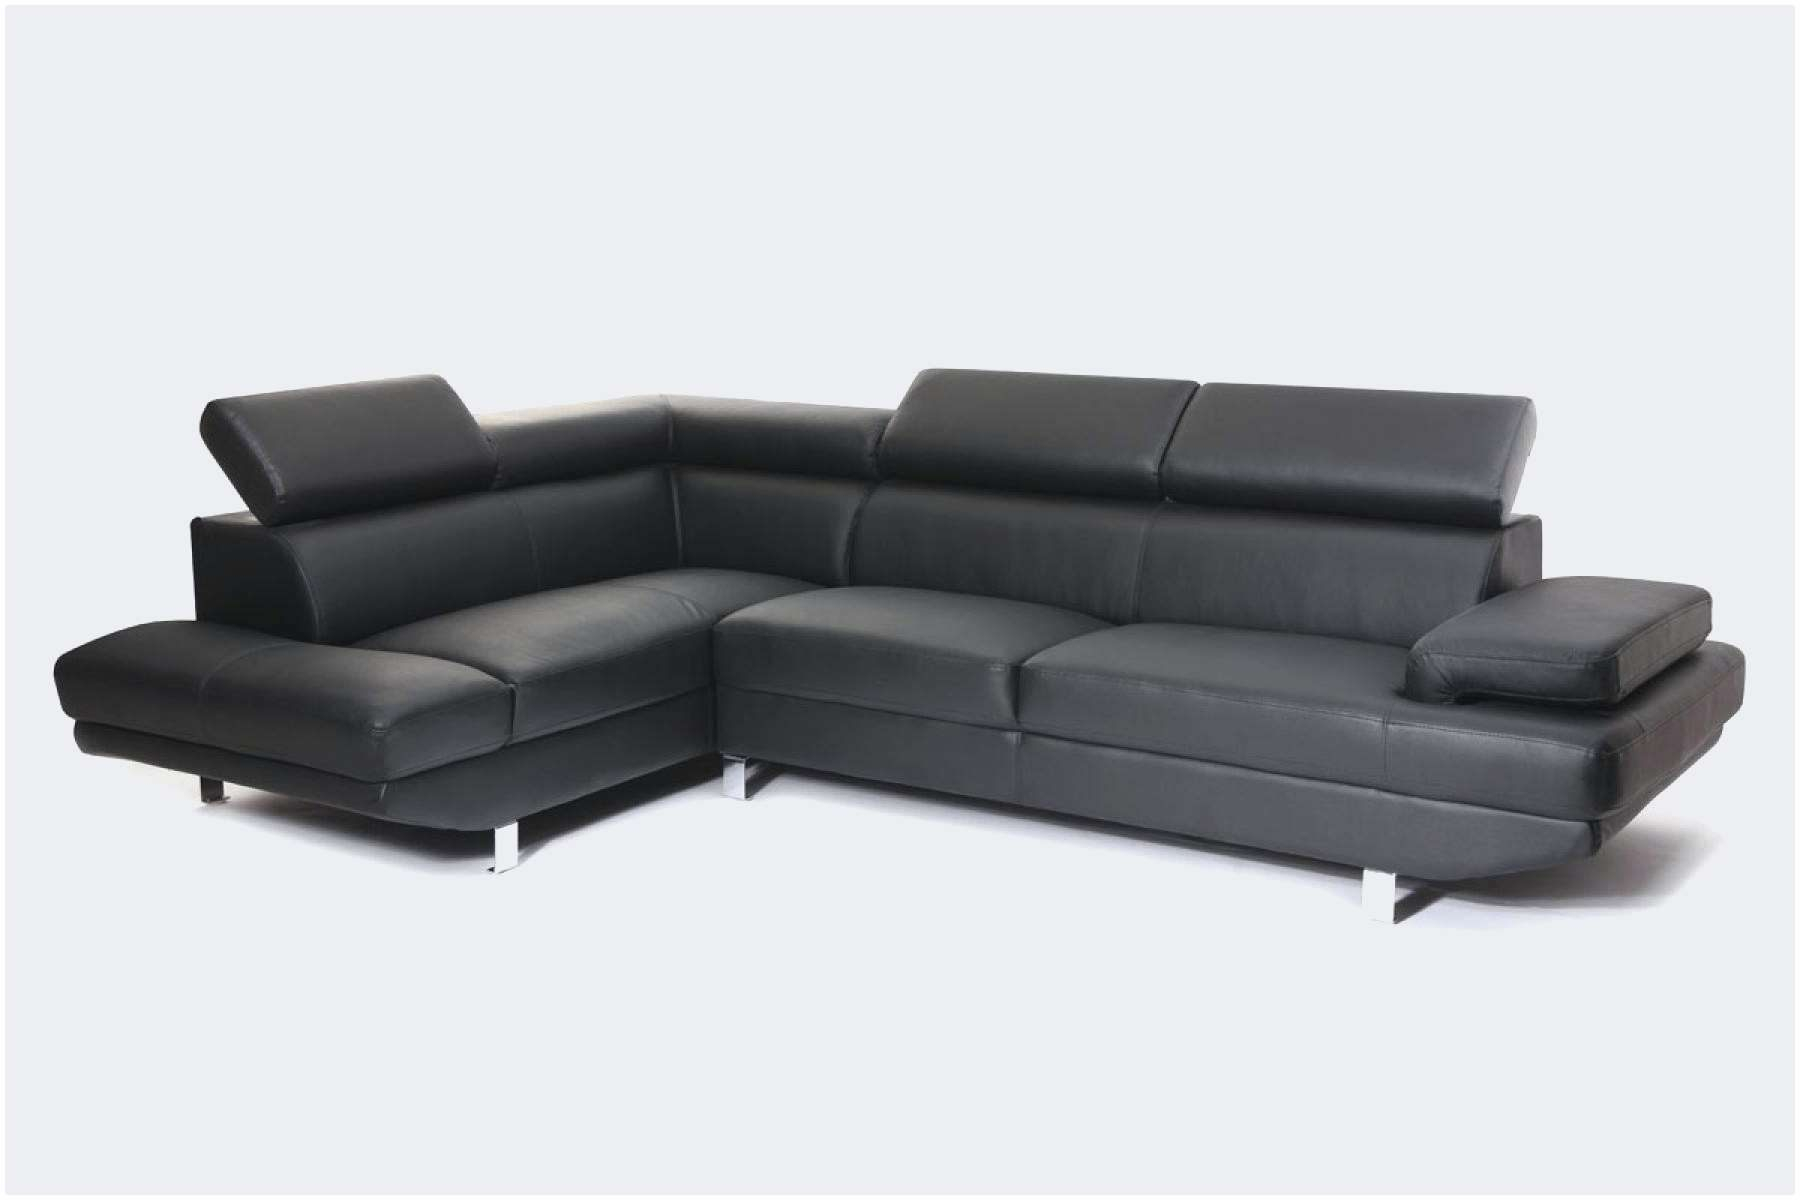 Canapé Ikea Convertible 2 Places lit gigogne ikea occasion - qopo   hülsta lowboard eiche